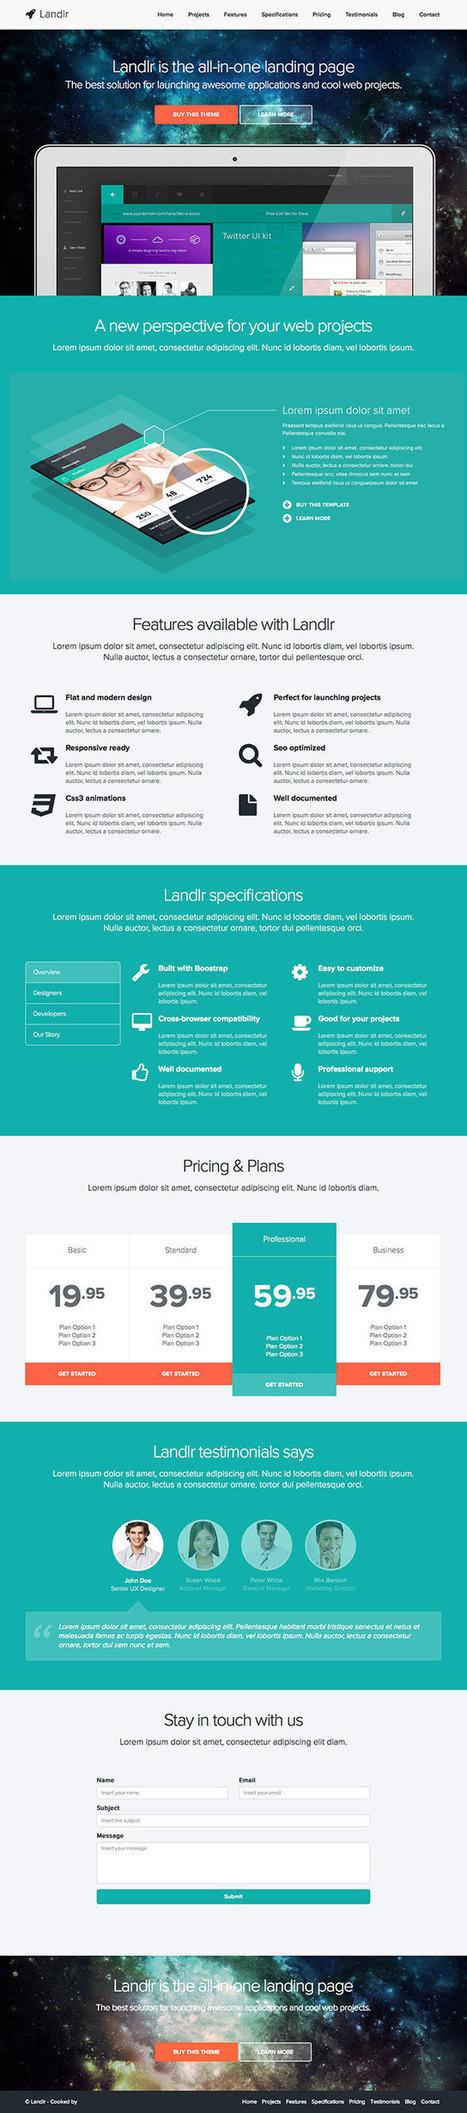 Top 10 Landing Page sous WordPress 2014 | SeoPowa | Internet | Scoop.it